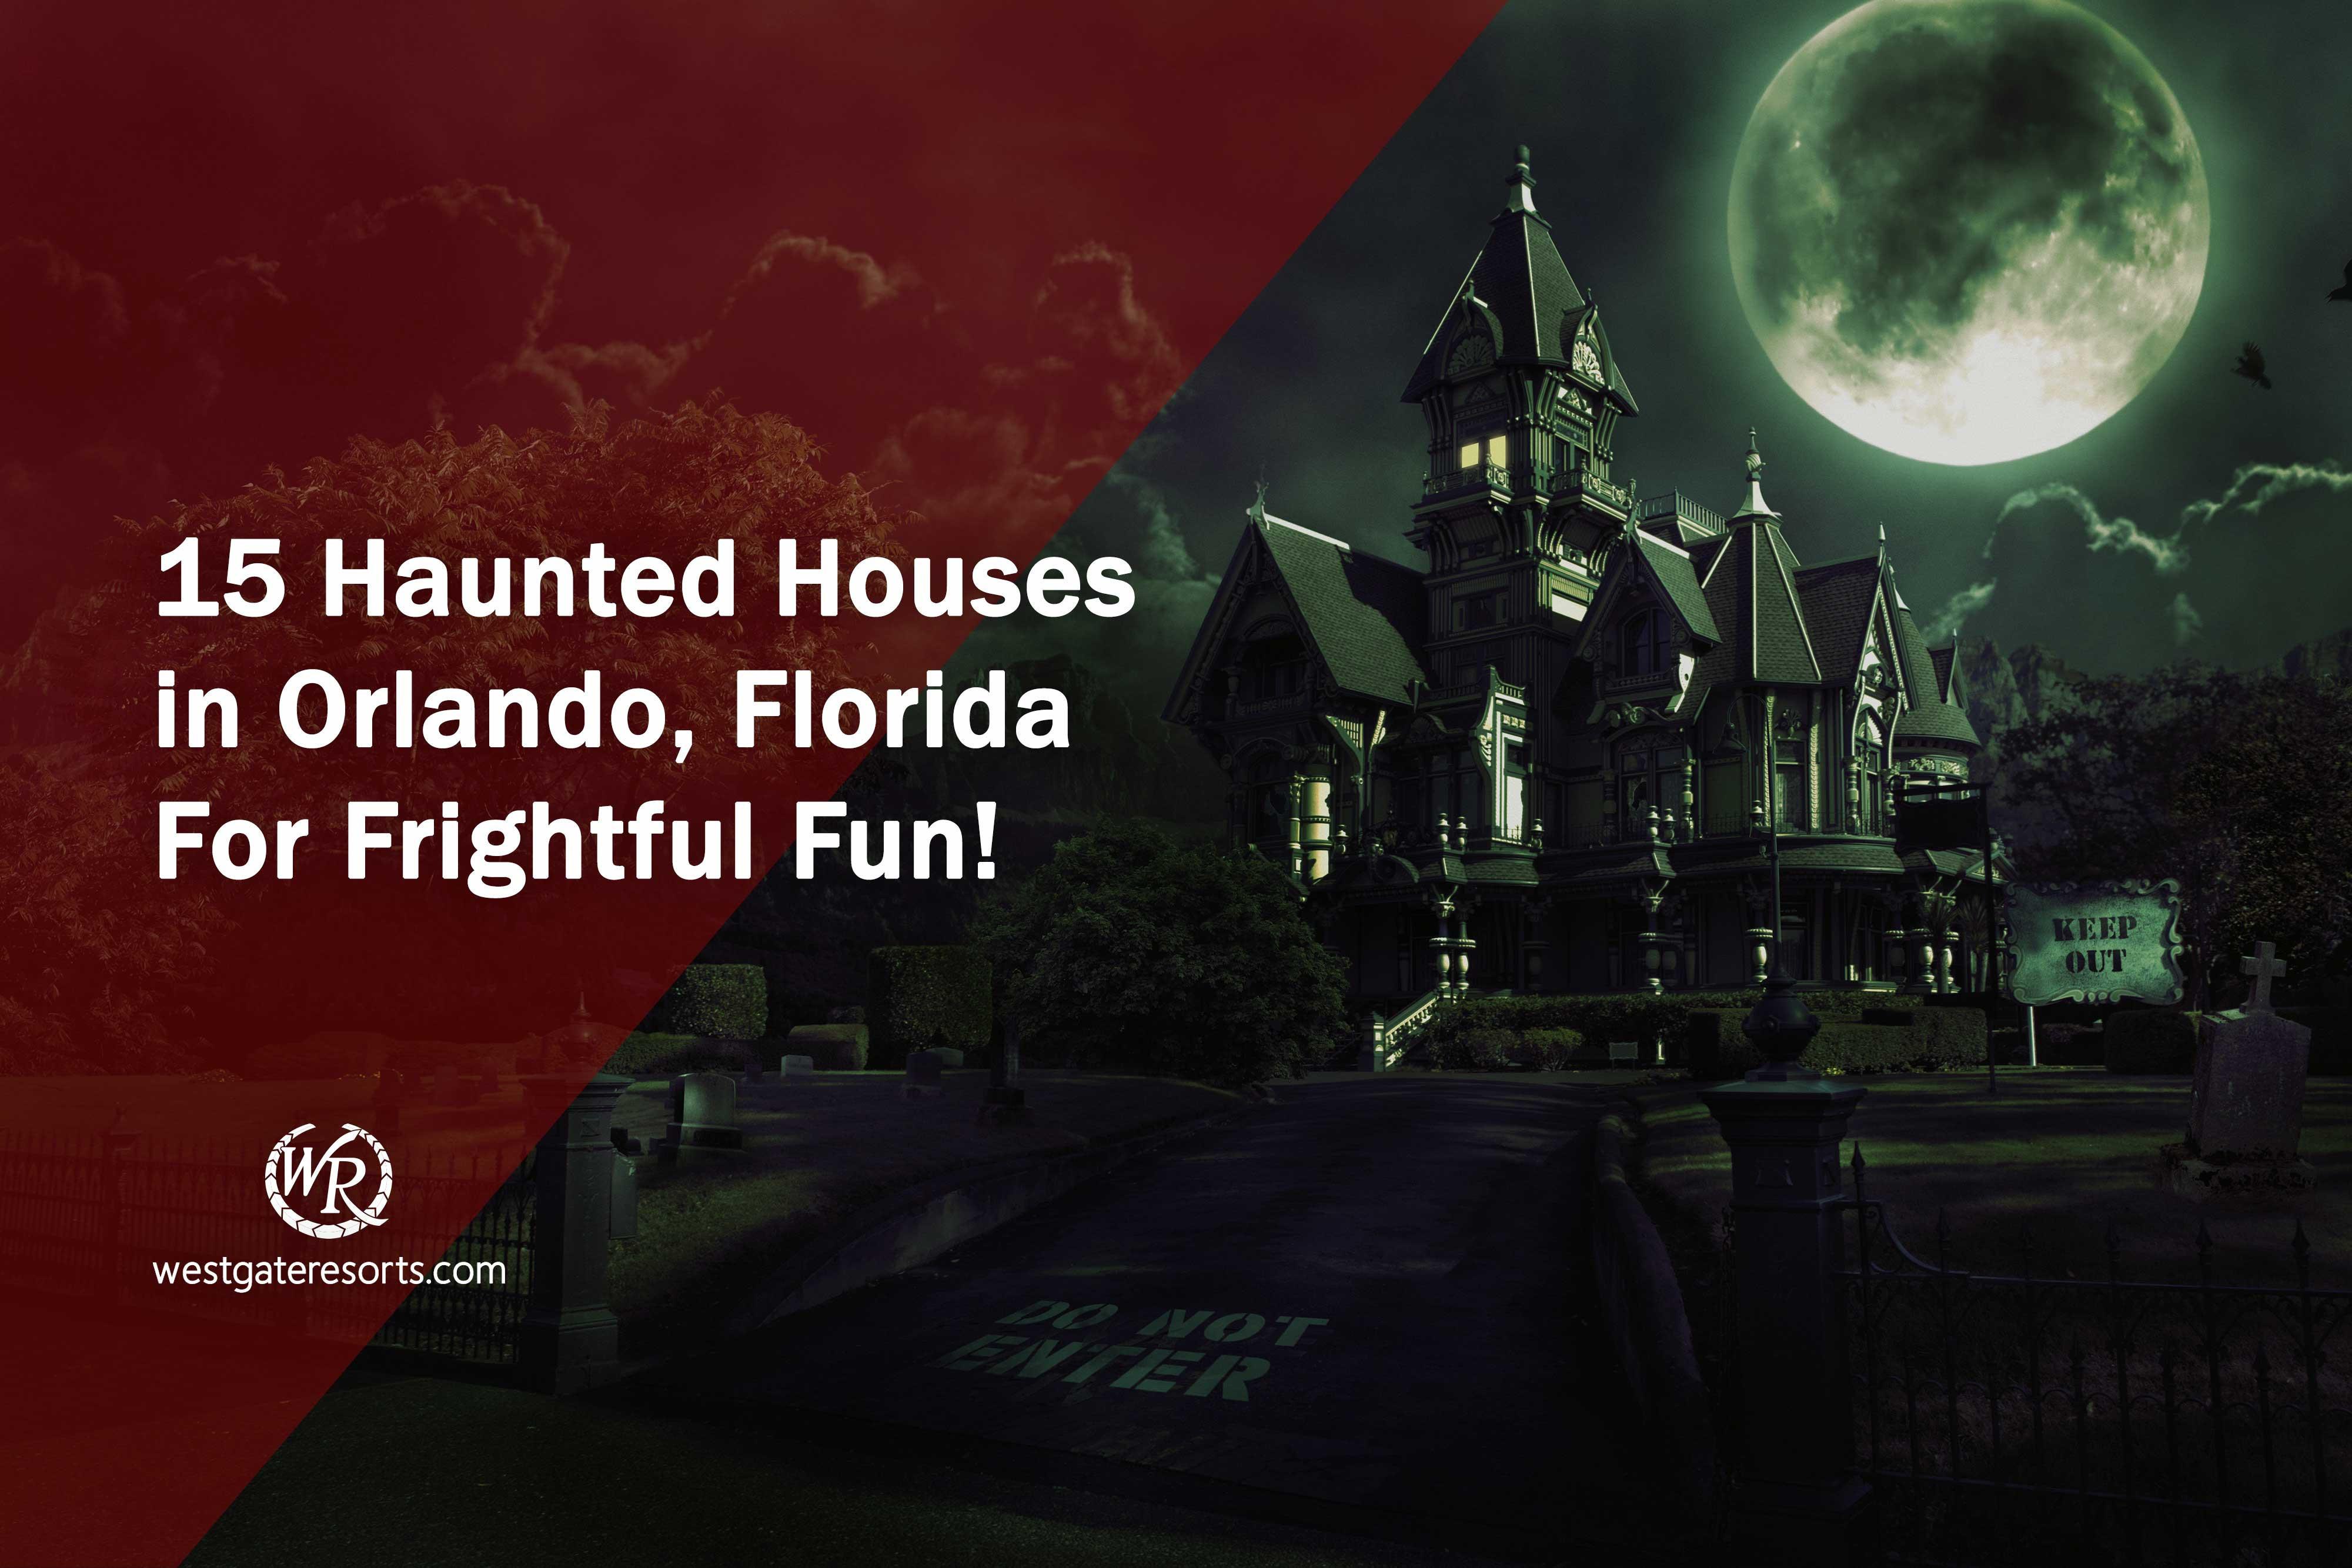 15 Haunted Houses in Orlando Florida For Frightful Fun!